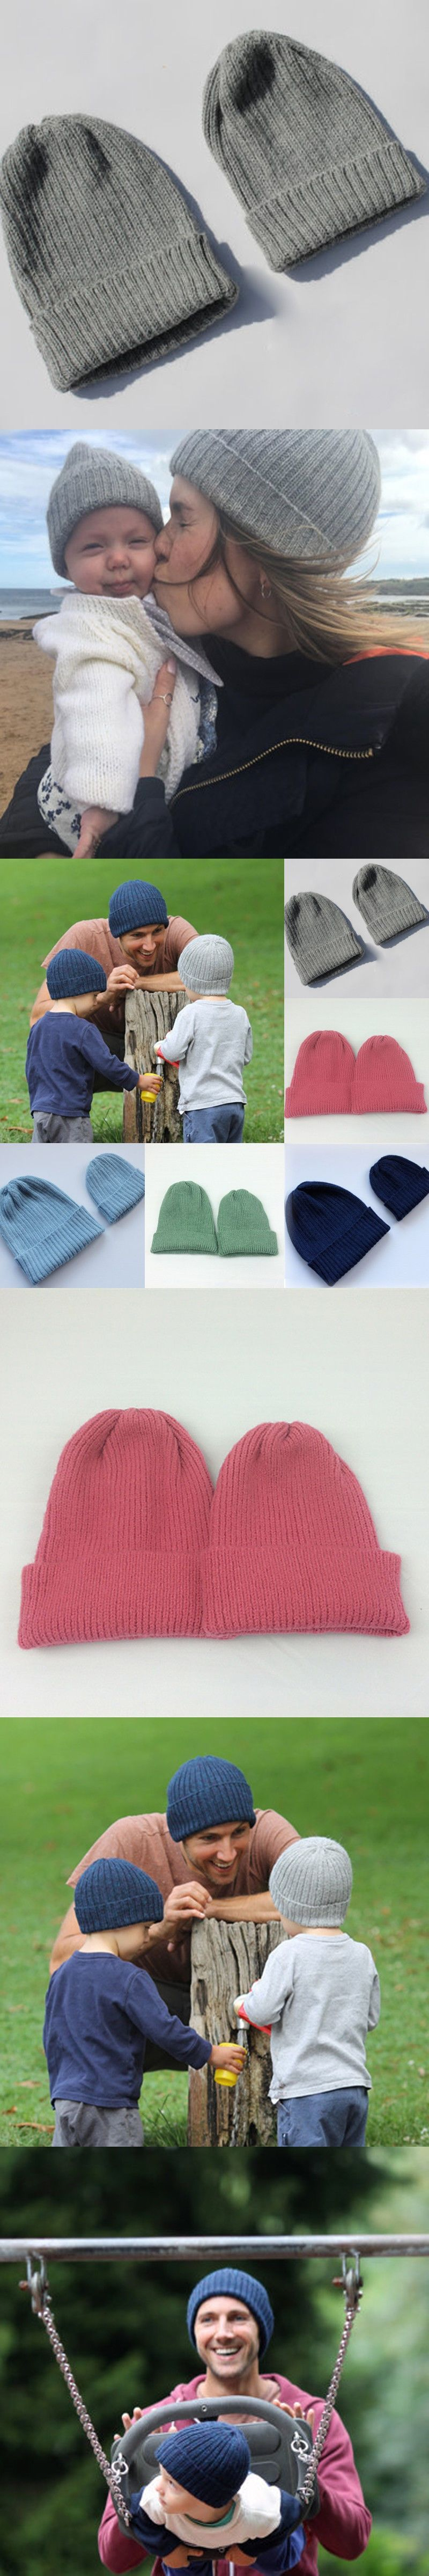 2PCS Knitted Cap Lovely Cute Parent-Child Warm Autumn Winter Woolen Beanie  Hat Family Match 794ee65c853